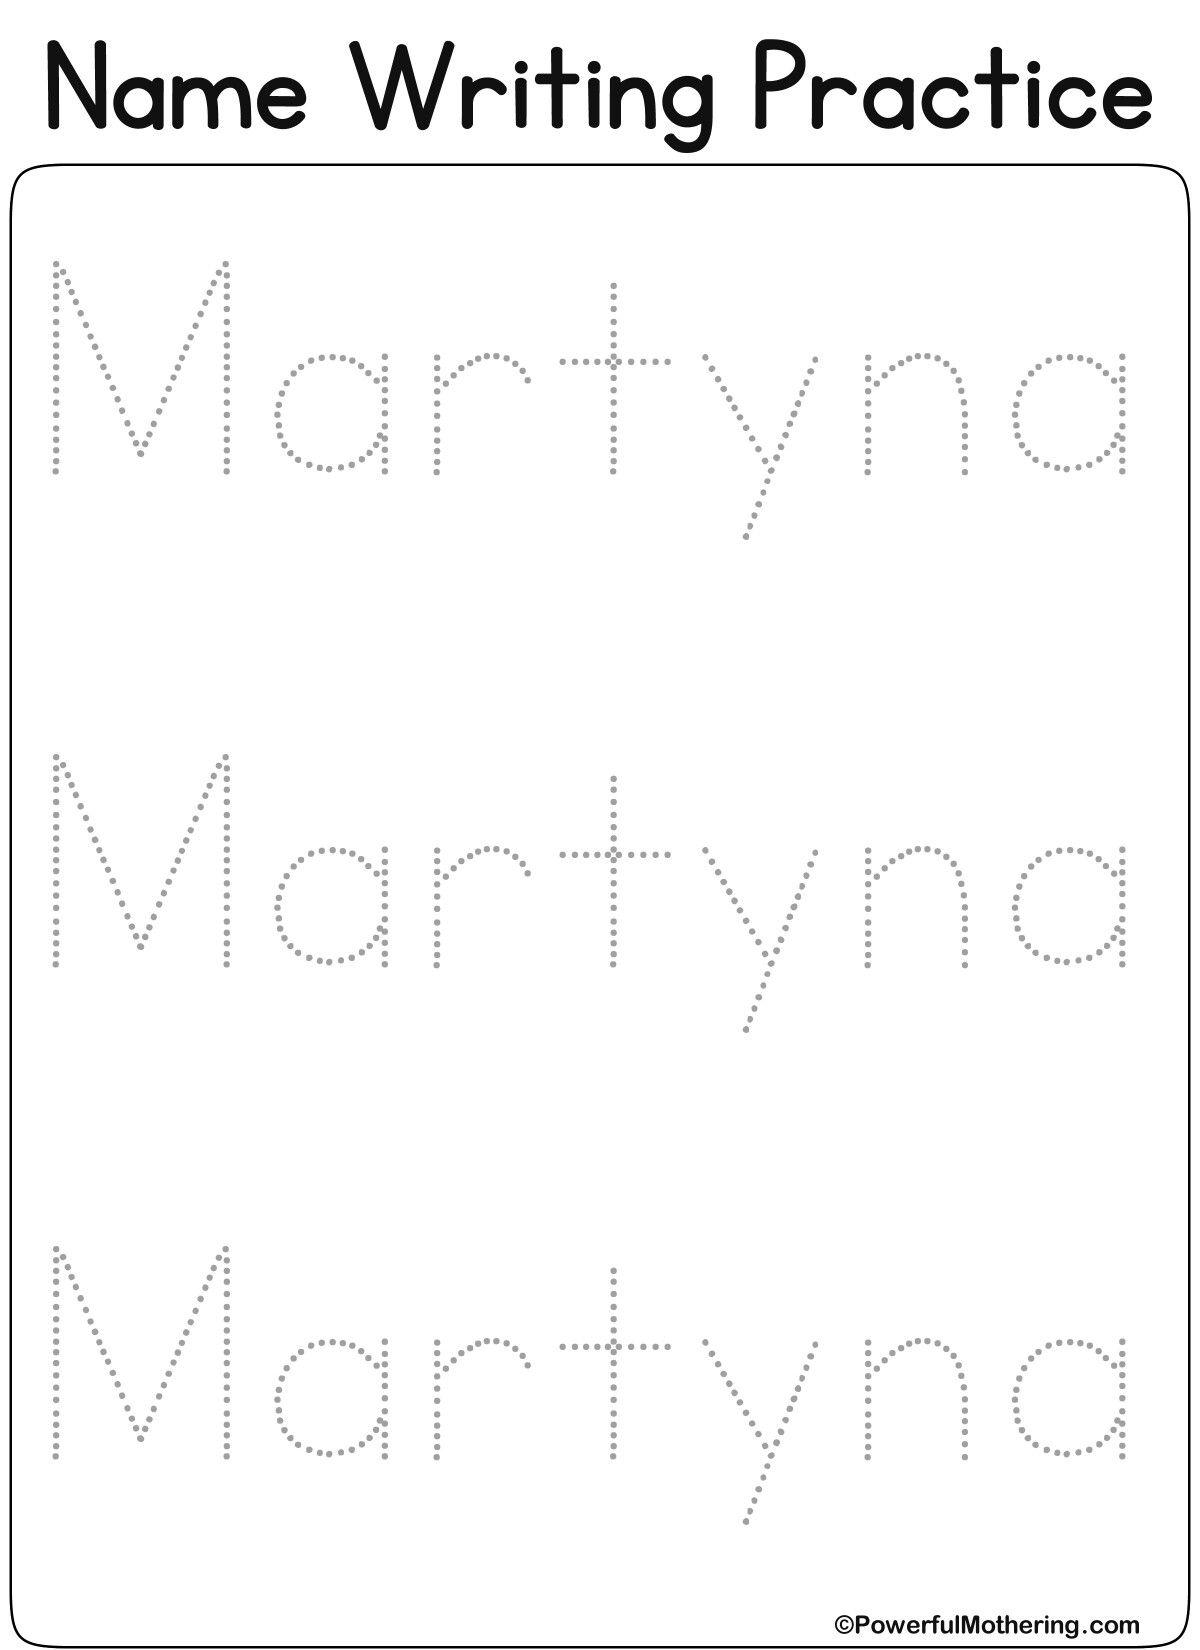 Pin By Anna Kucharska On Name Writing Practice